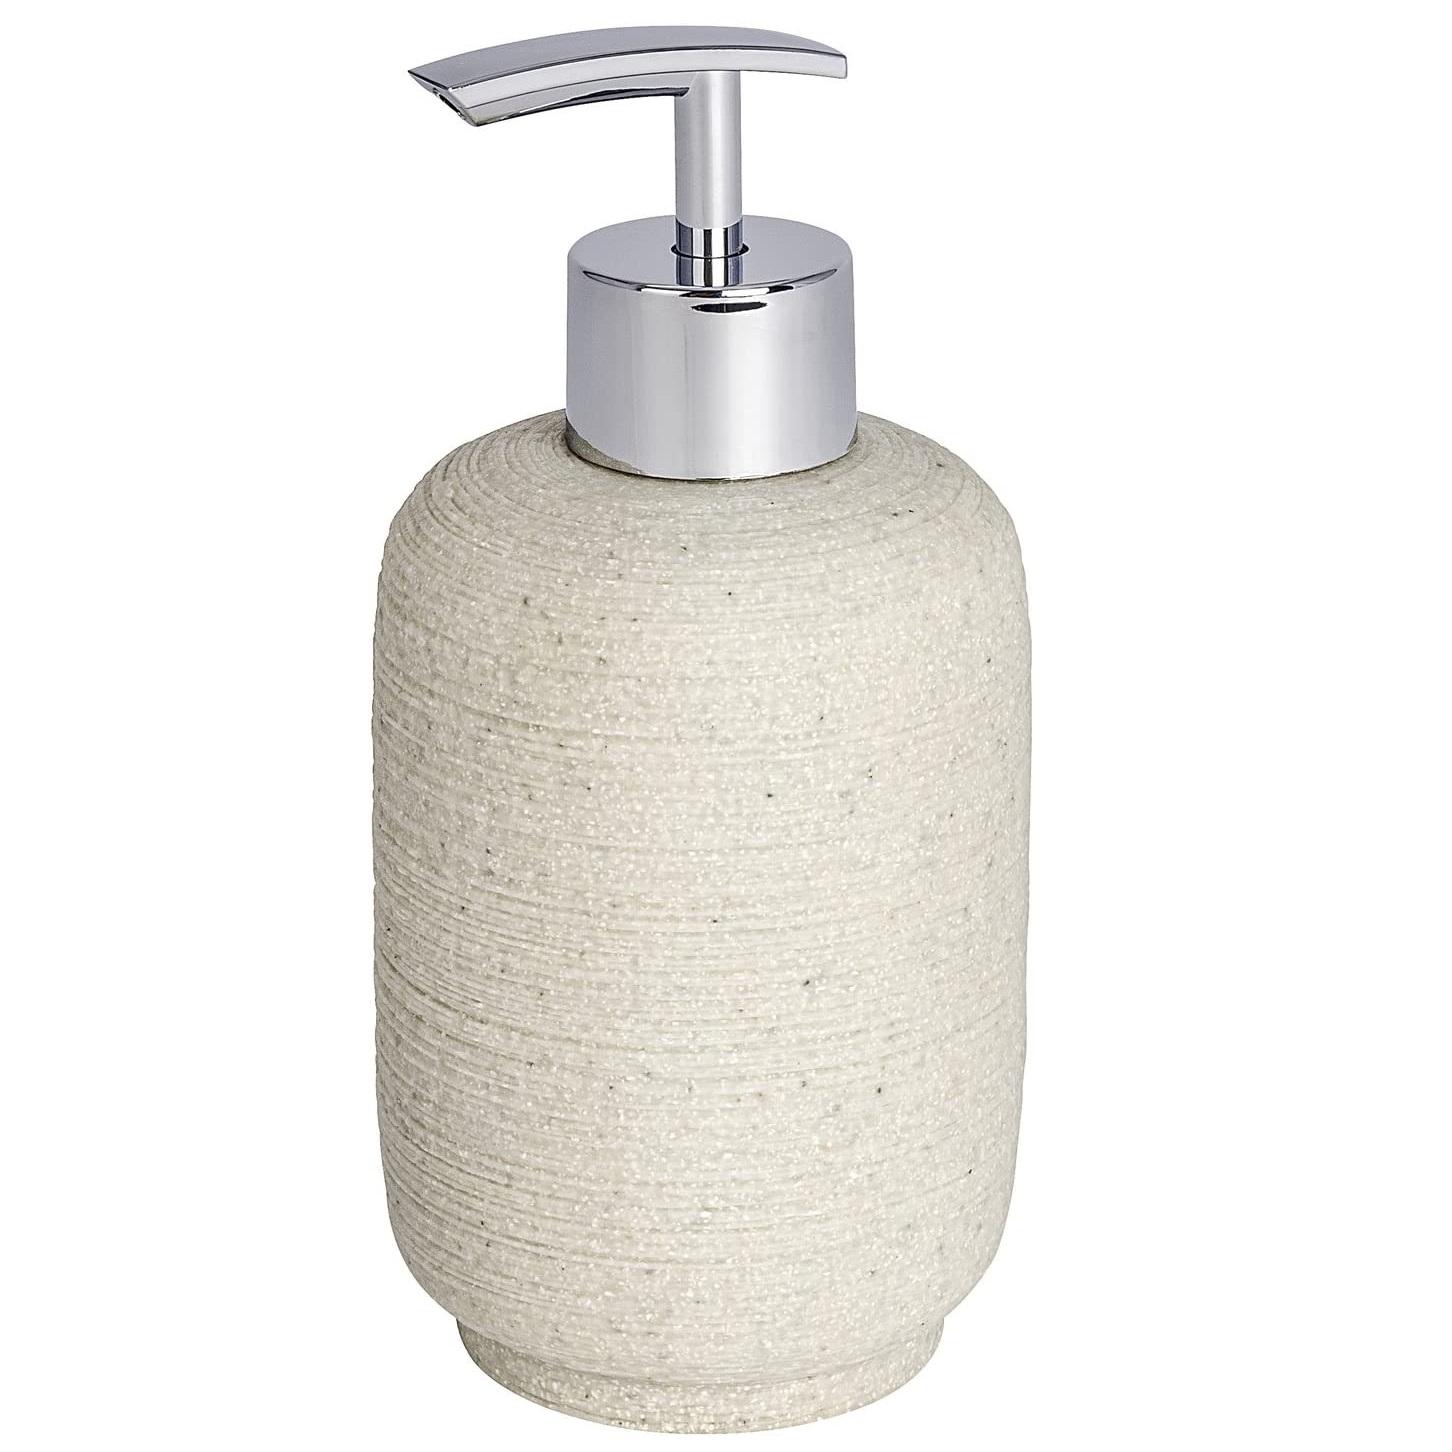 Дозатор для мыла Wenko sanitary go neo бежевый 8х8х16 см 0,3л дозатор для мыла wenko sanitary goa бежевый